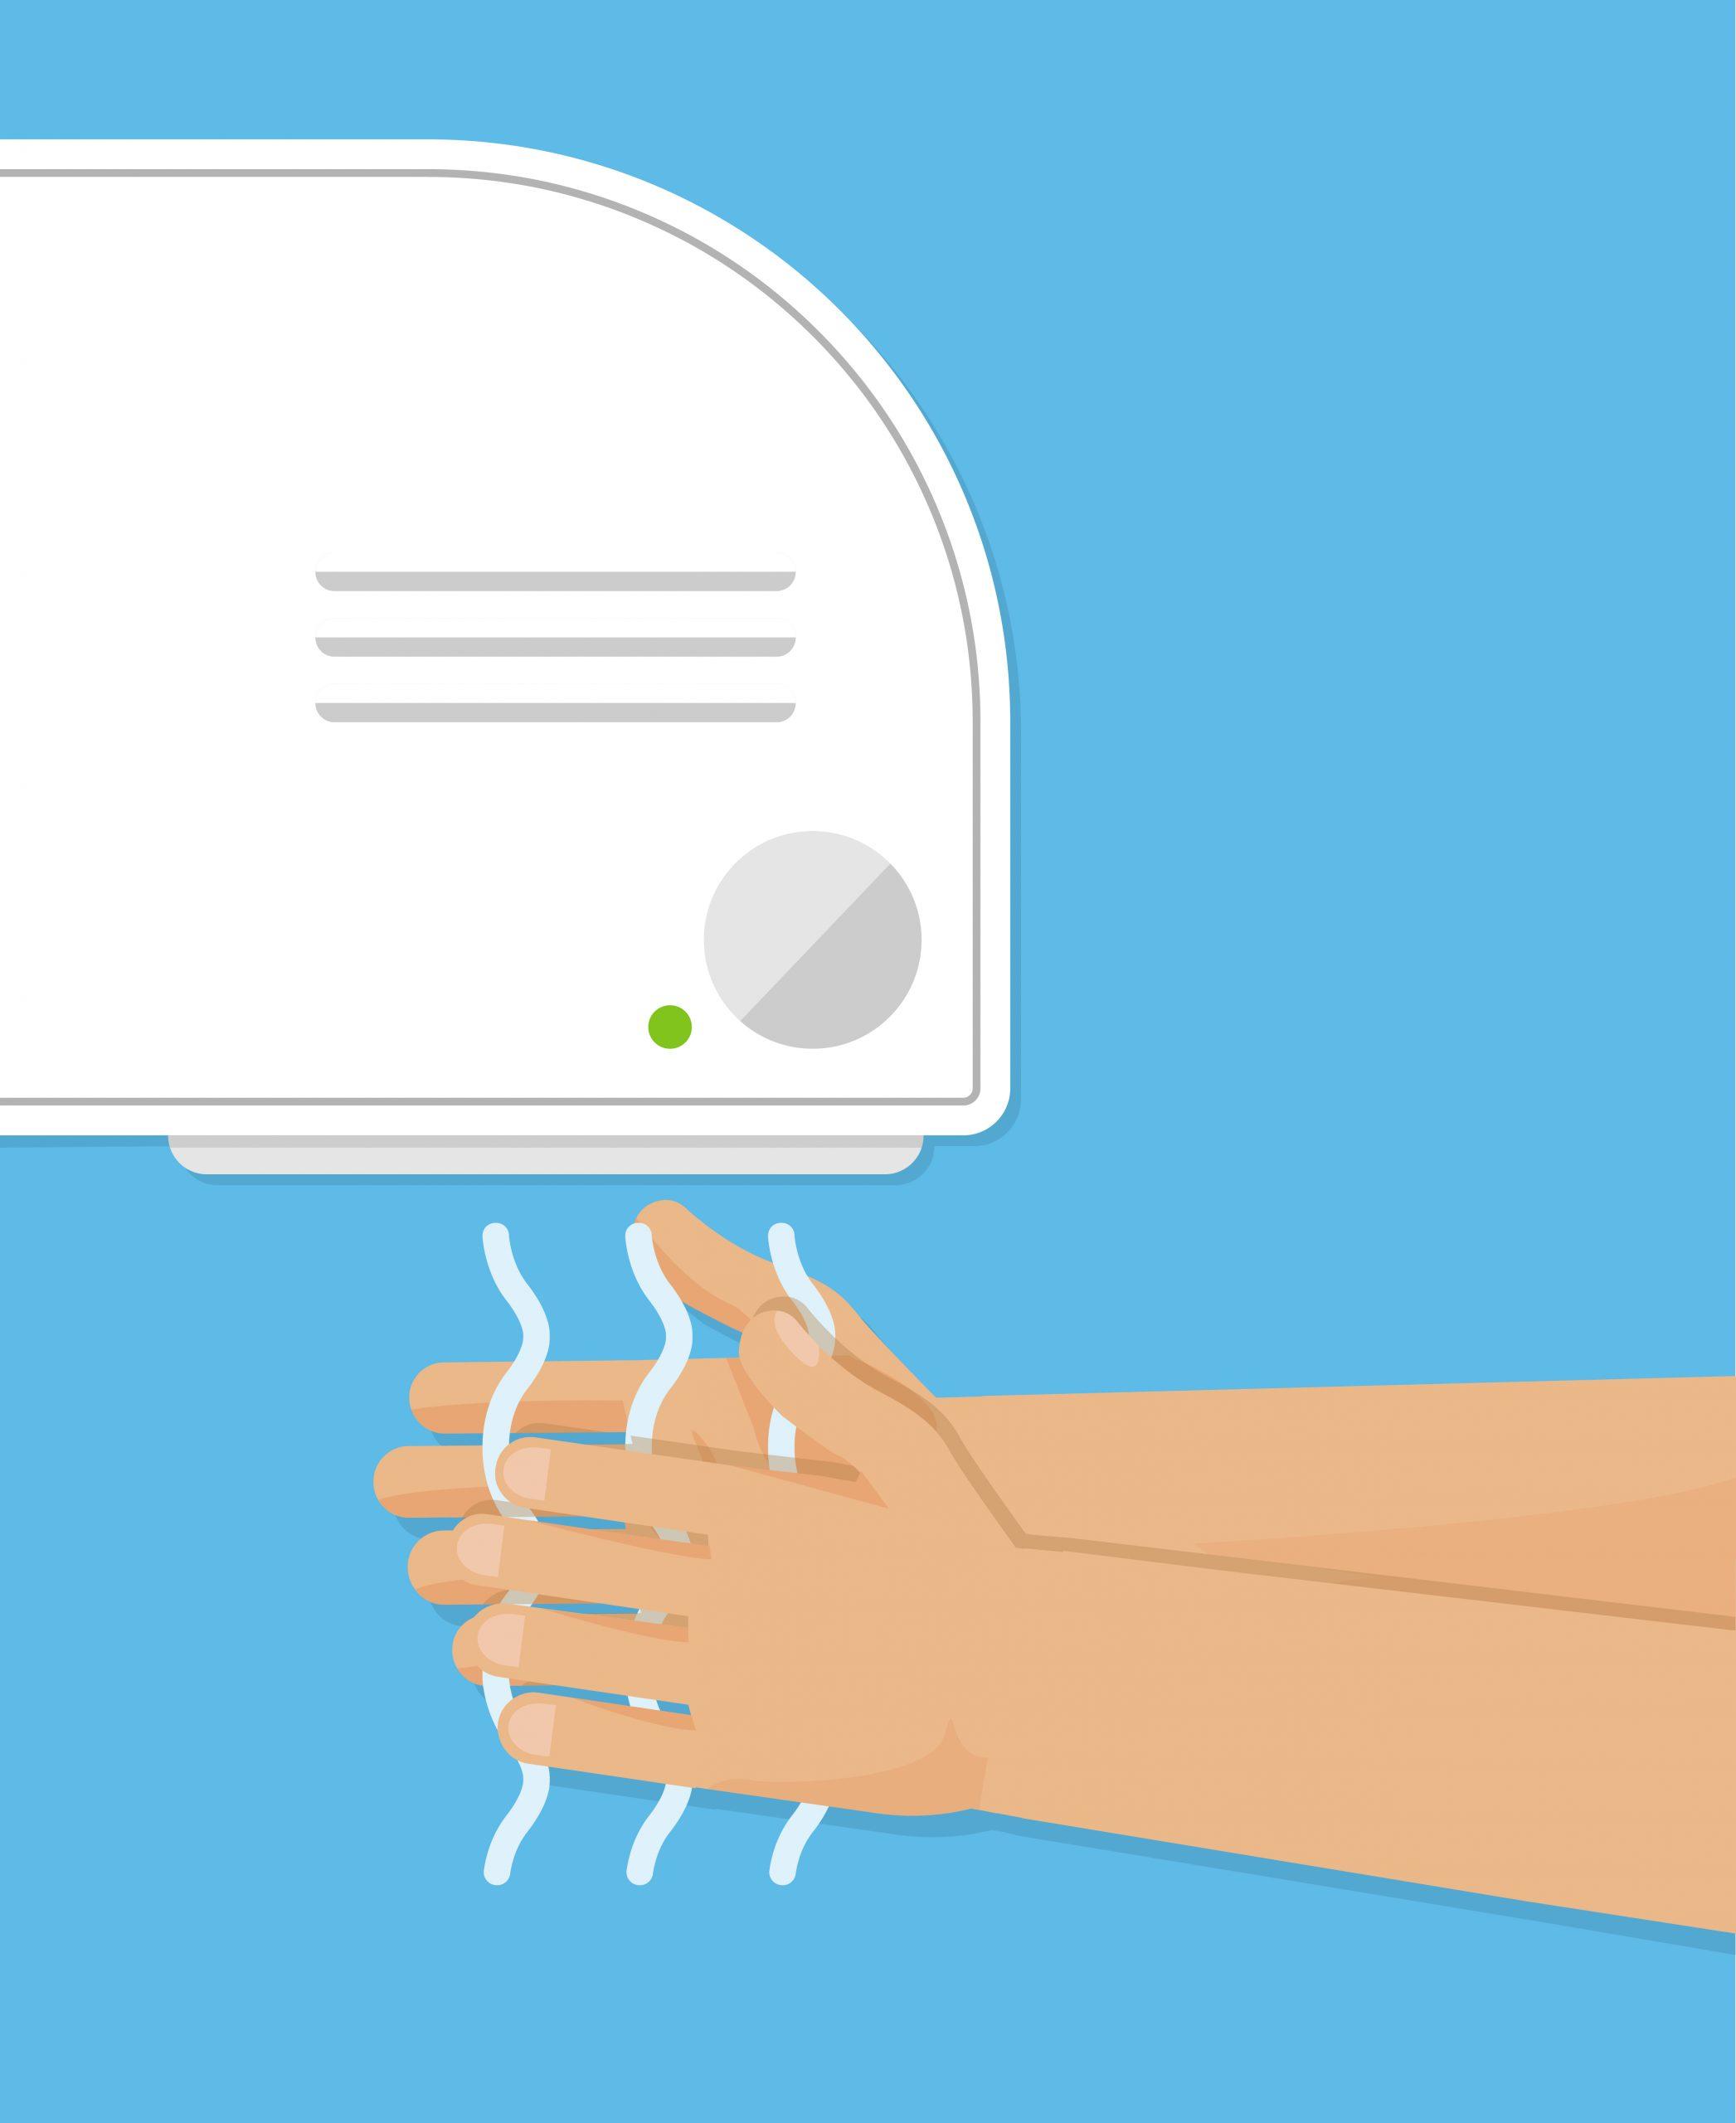 Hand dryer icon. Vector illustration